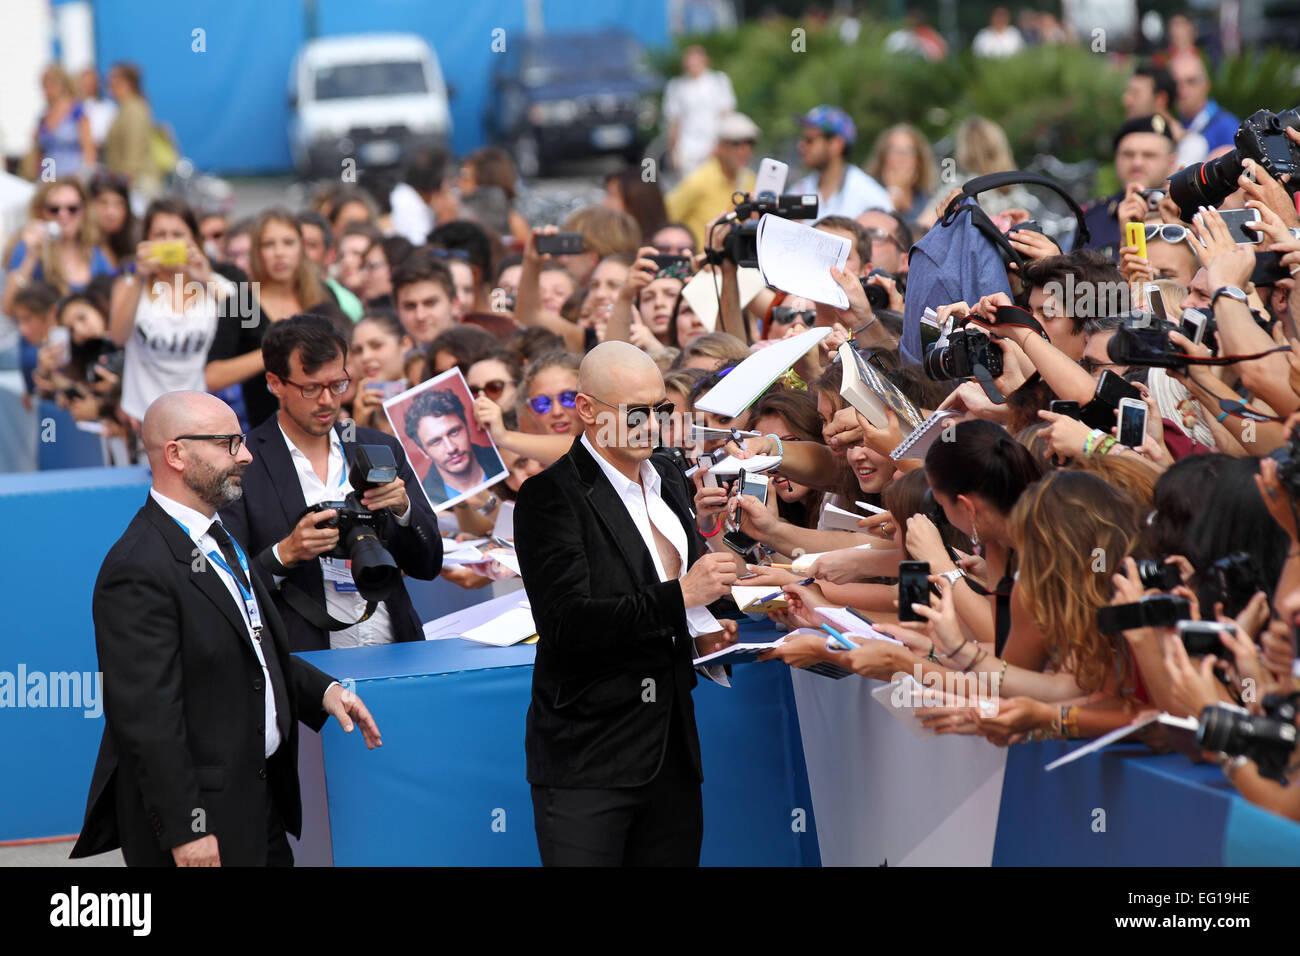 Italia, Venecia : director y actor estadounidense James Franco firma autógrafos Imagen De Stock